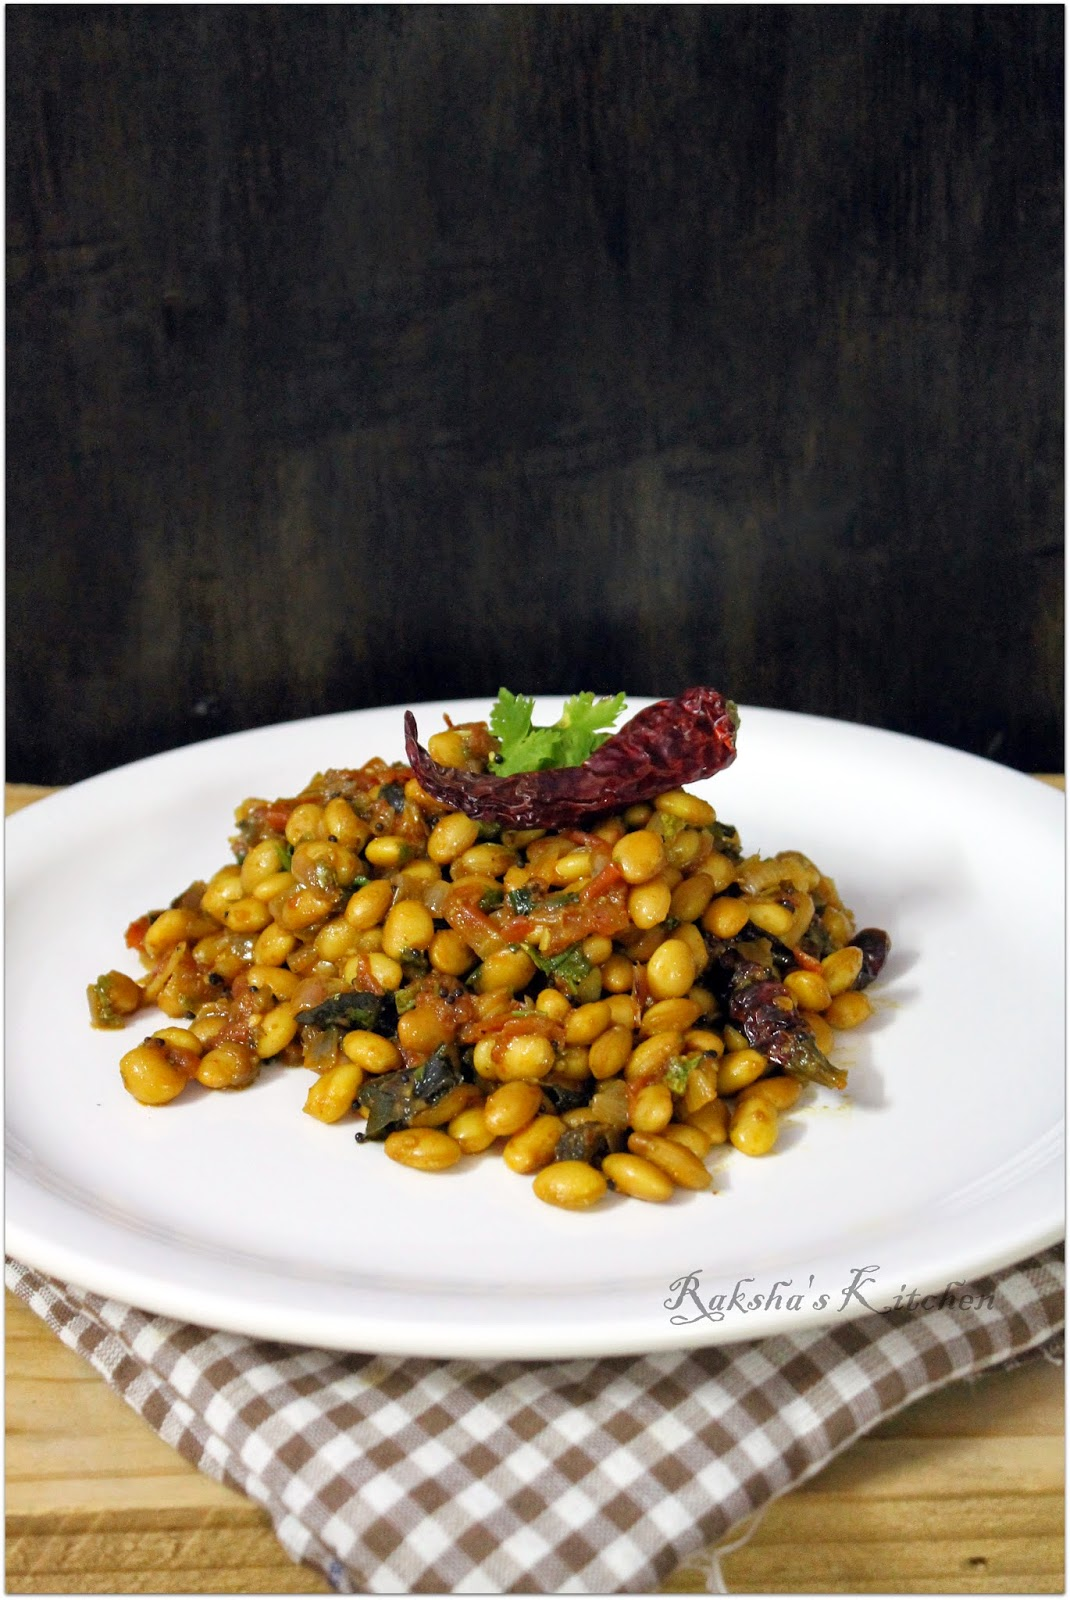 aavryachi oosali | hyacinth seeds stir fry | aavrekai stir fry